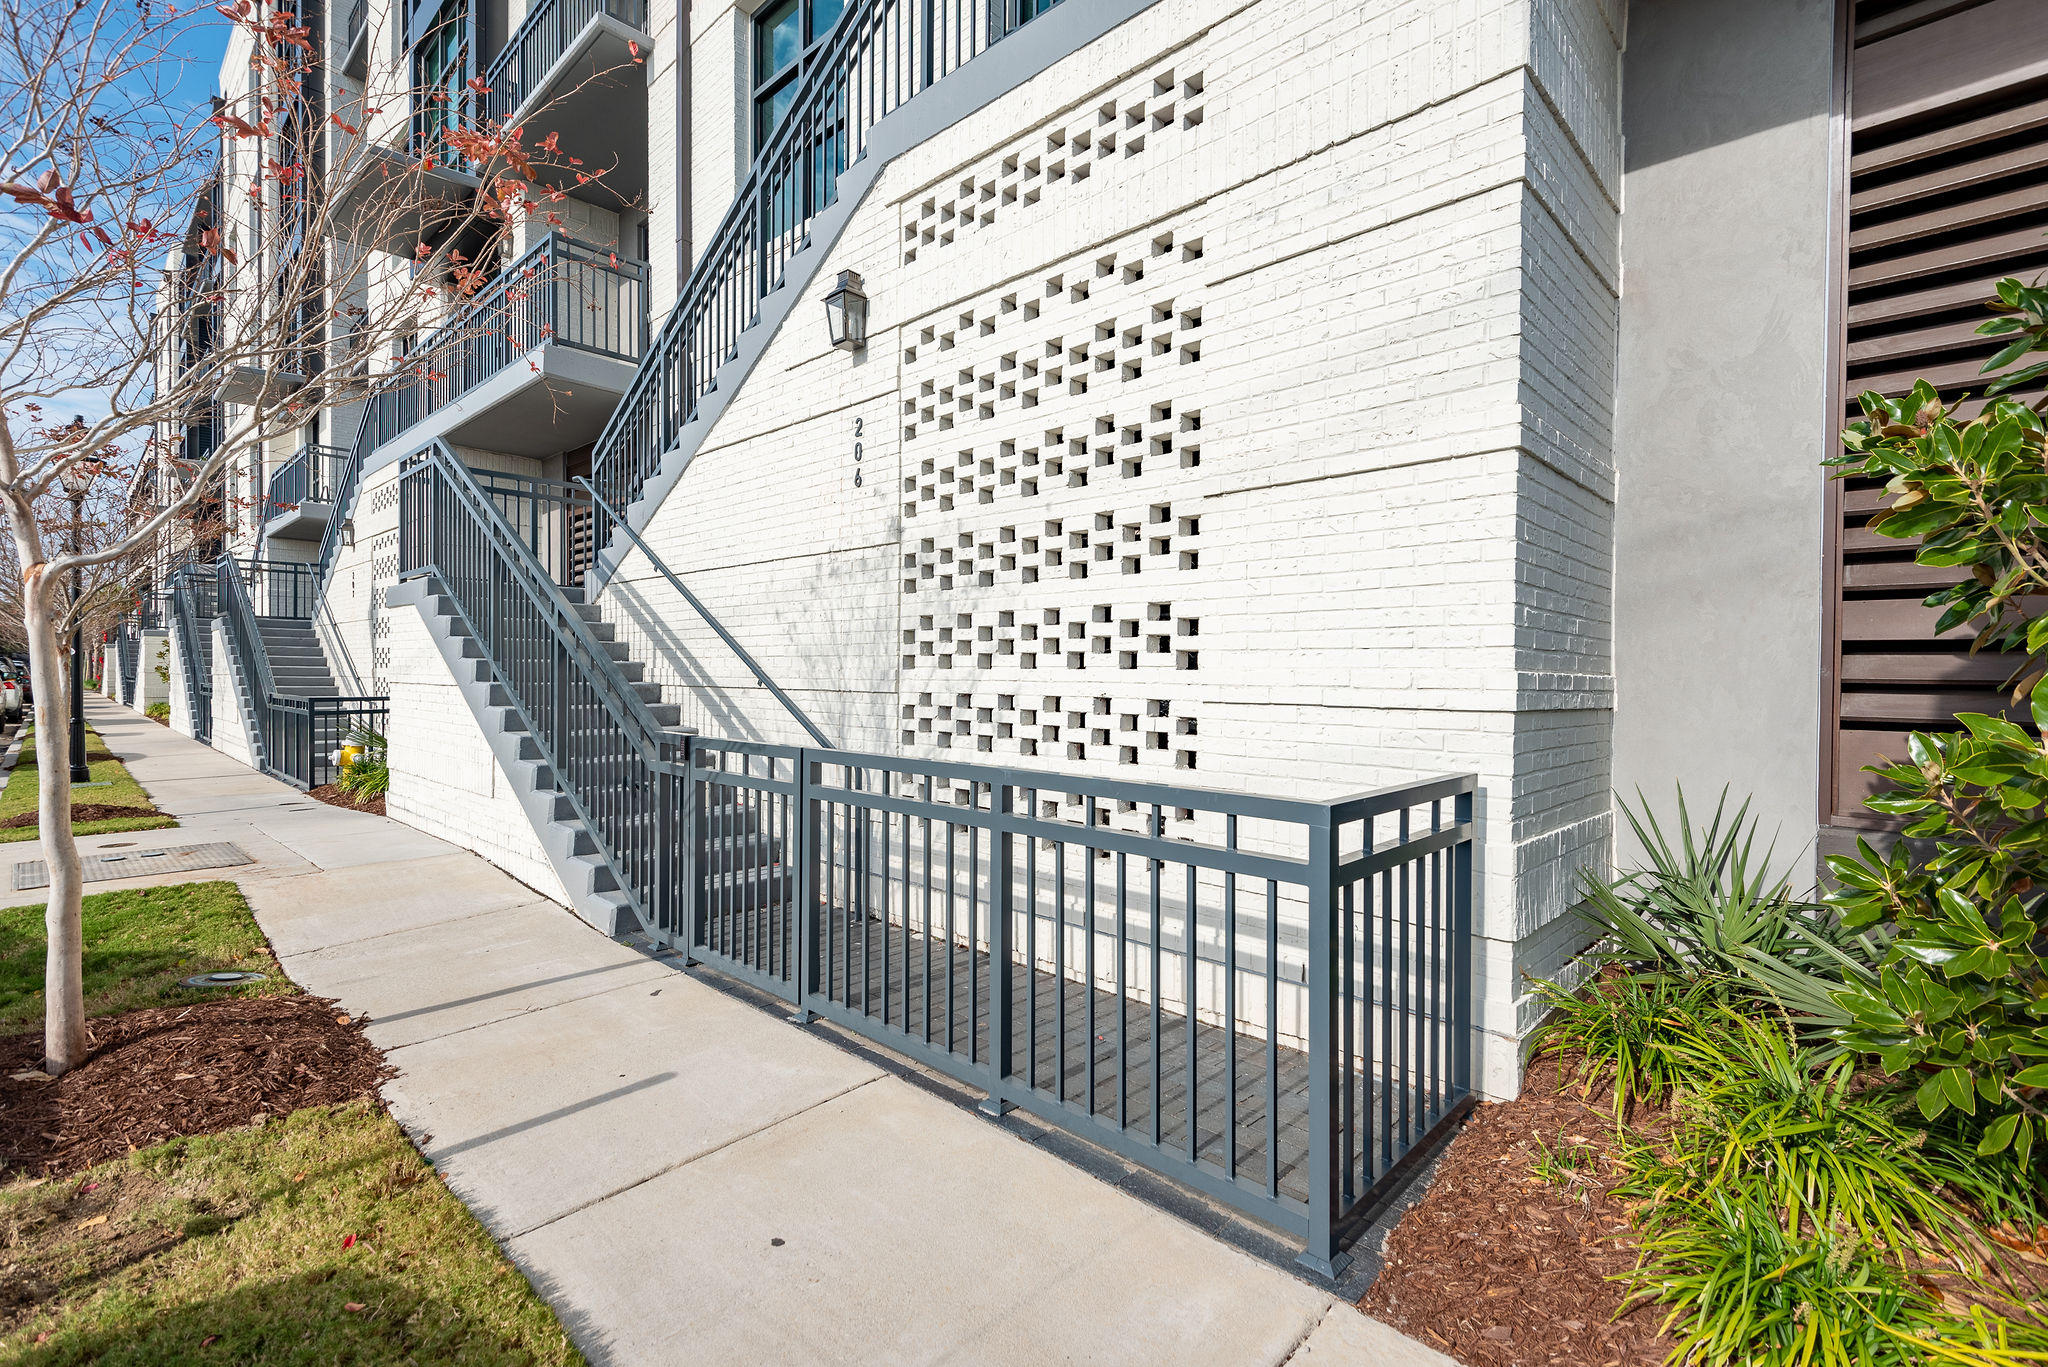 5 #206 Gadsdenboro Street Charleston, SC 29401